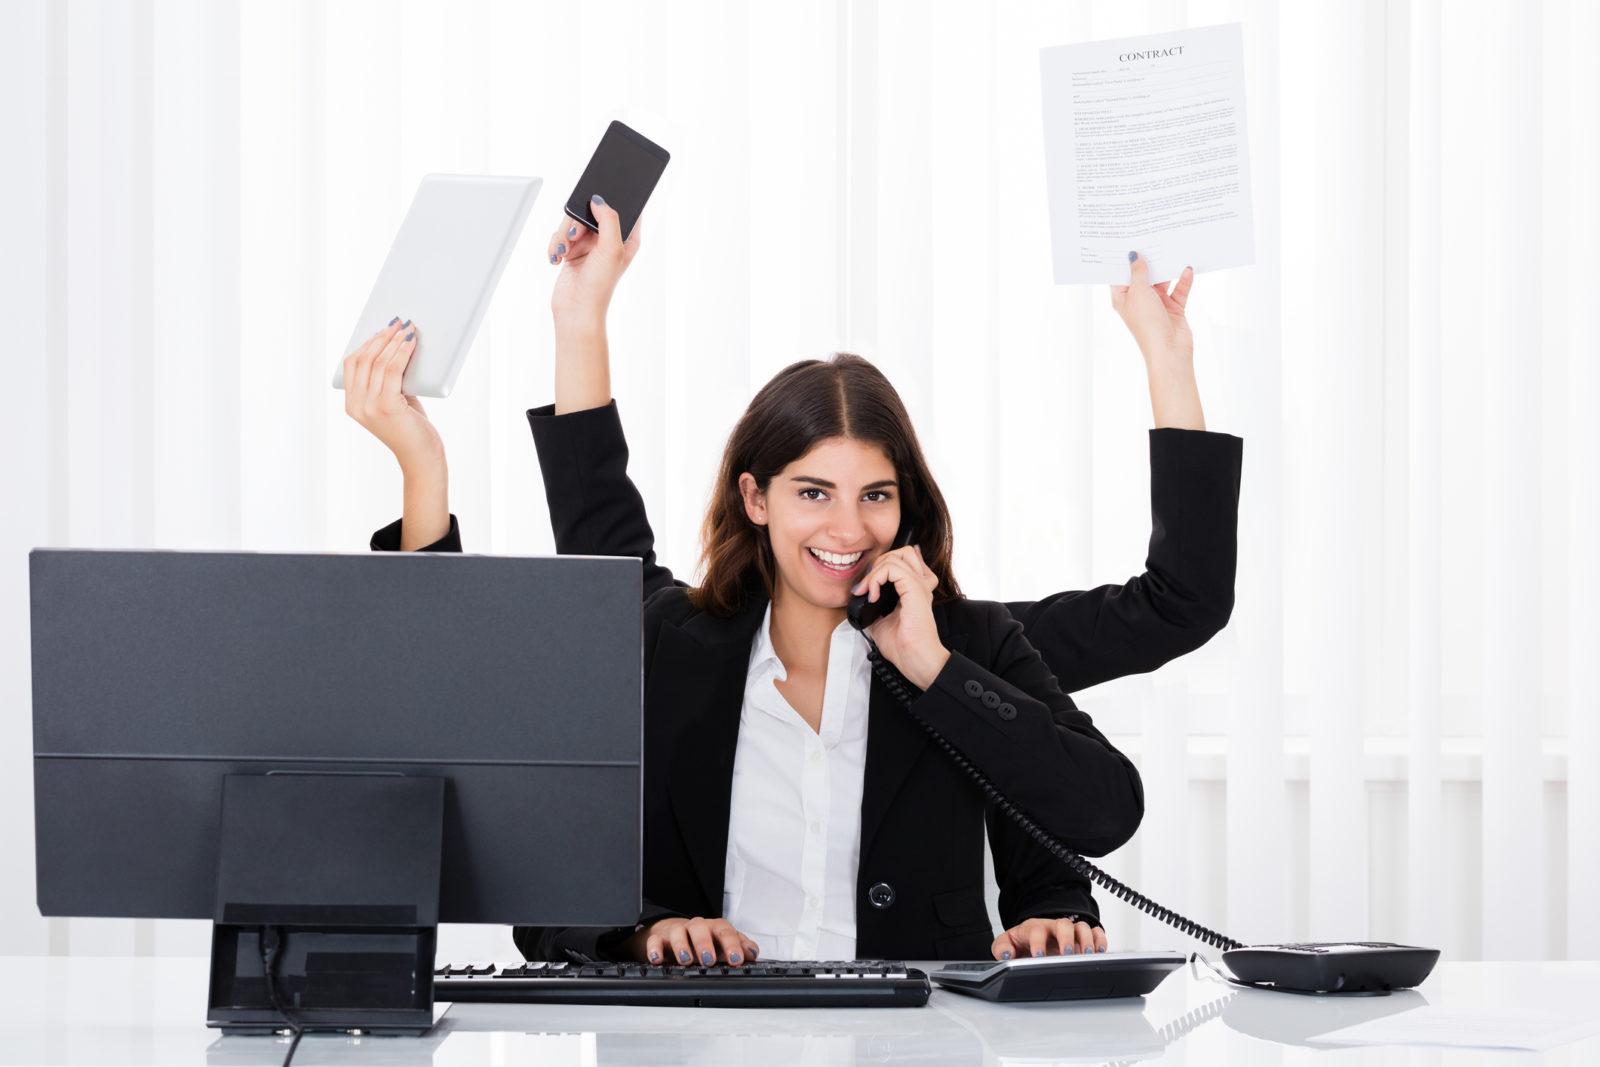 Busy Businesswoman Multitasking